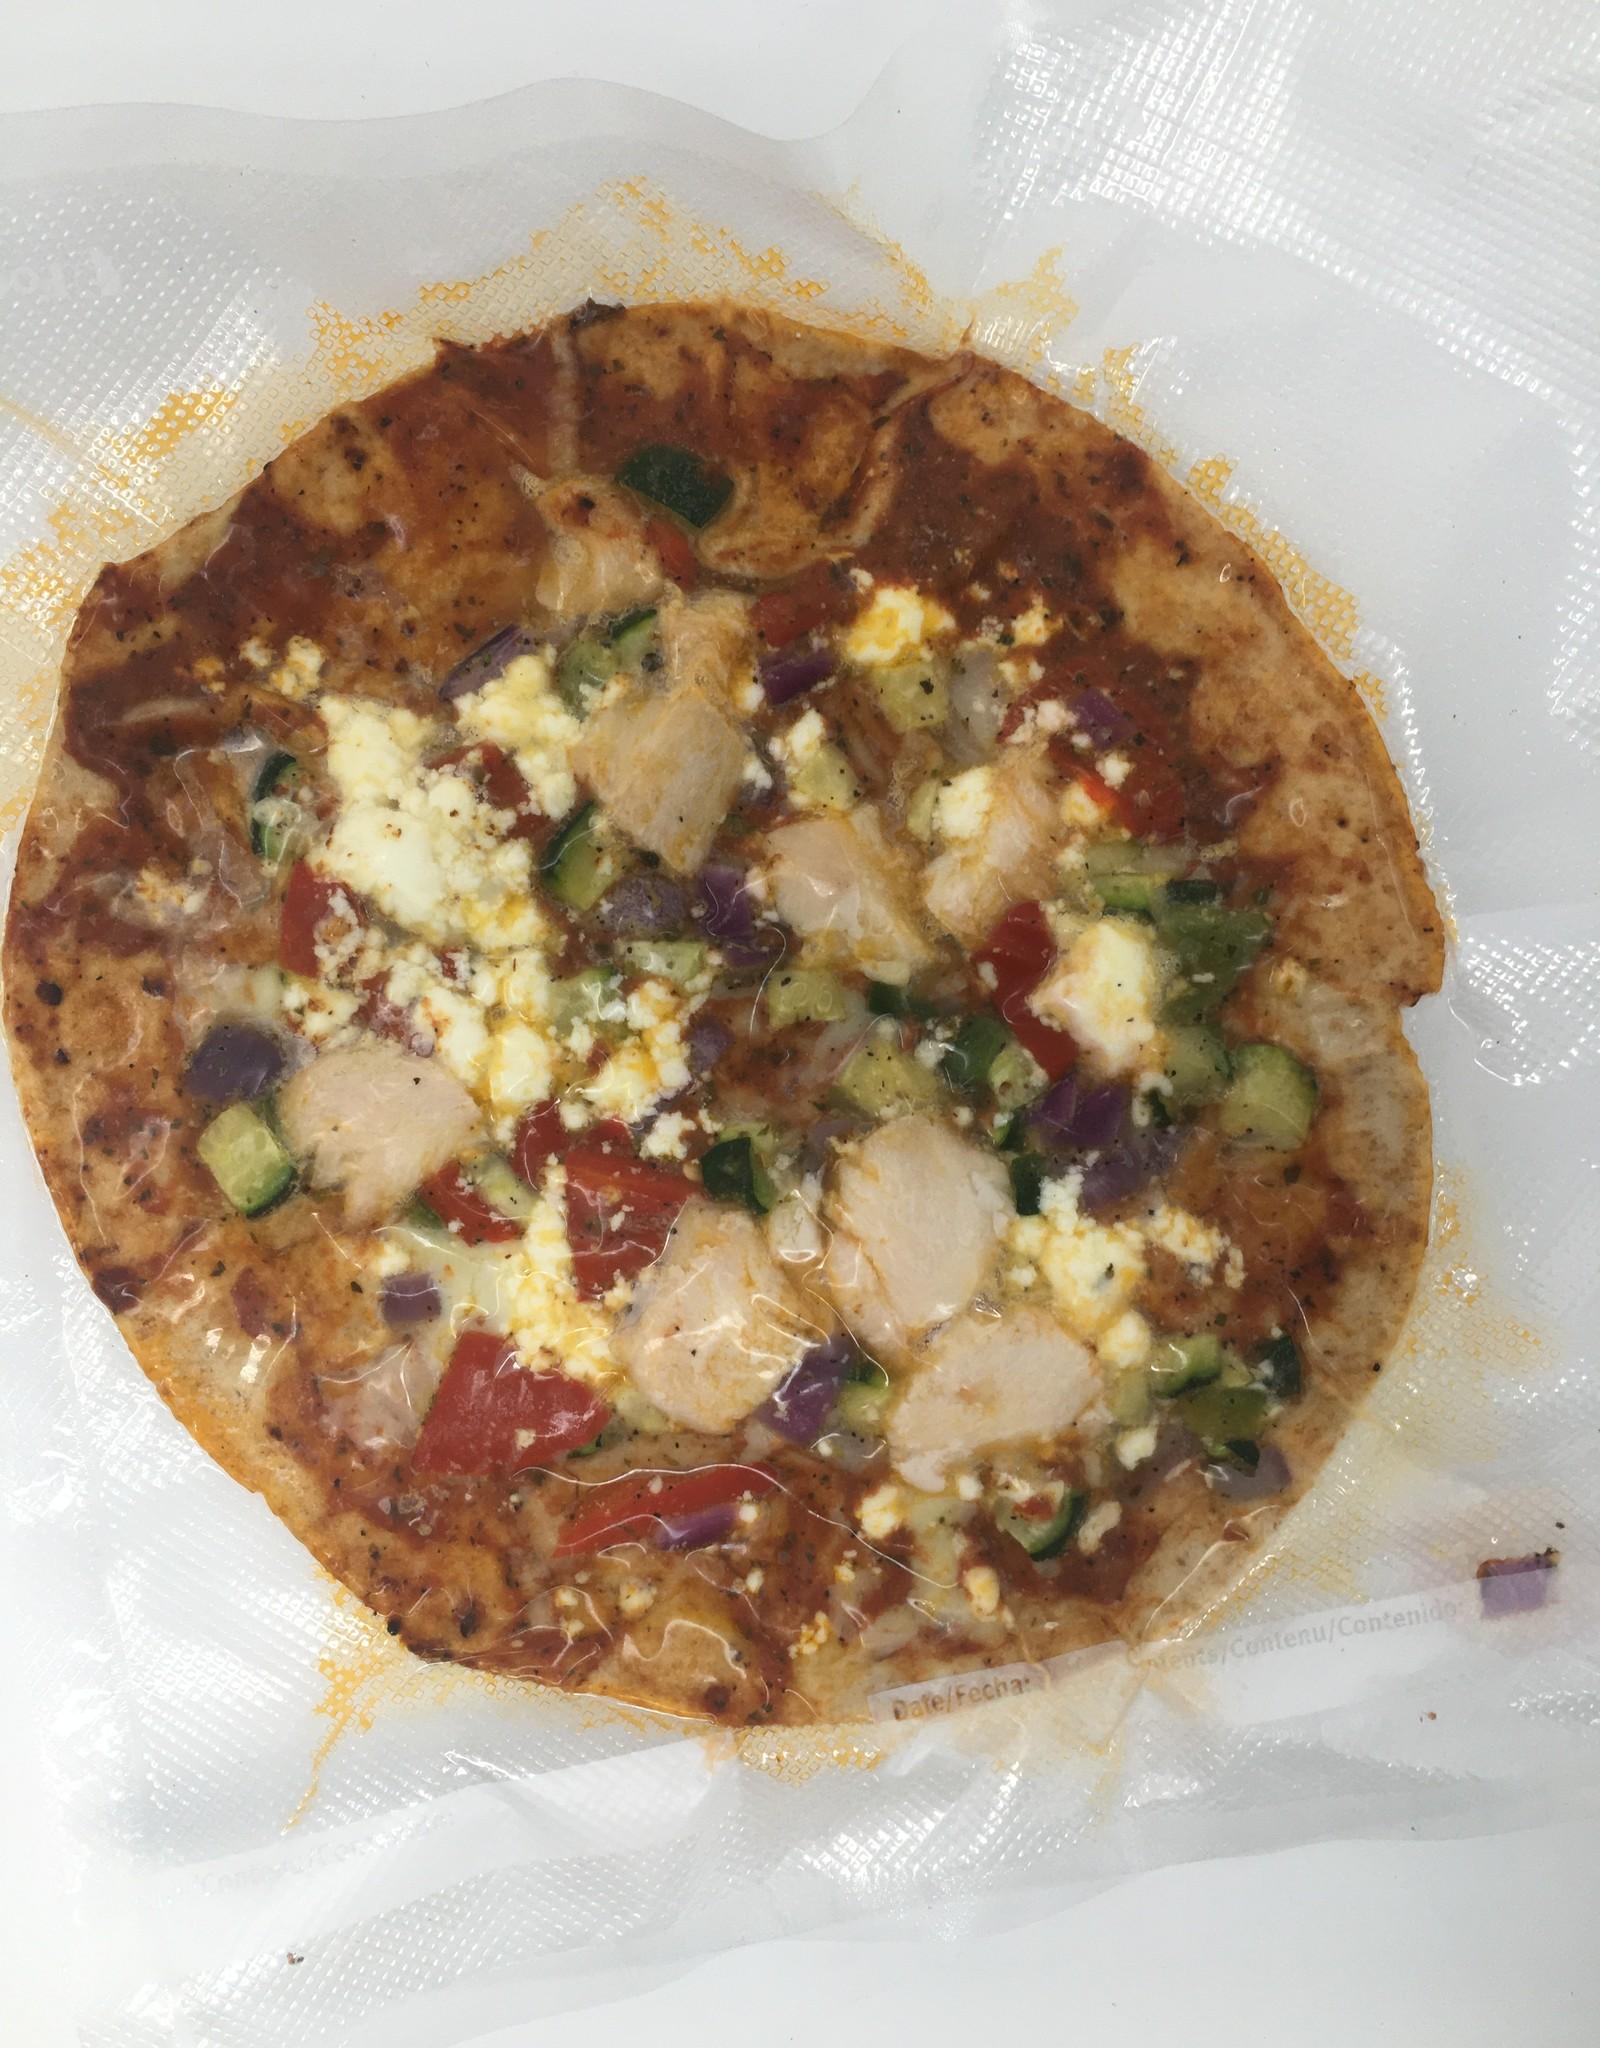 Vito's Vitos - Pizza, Chicken Mediterranean